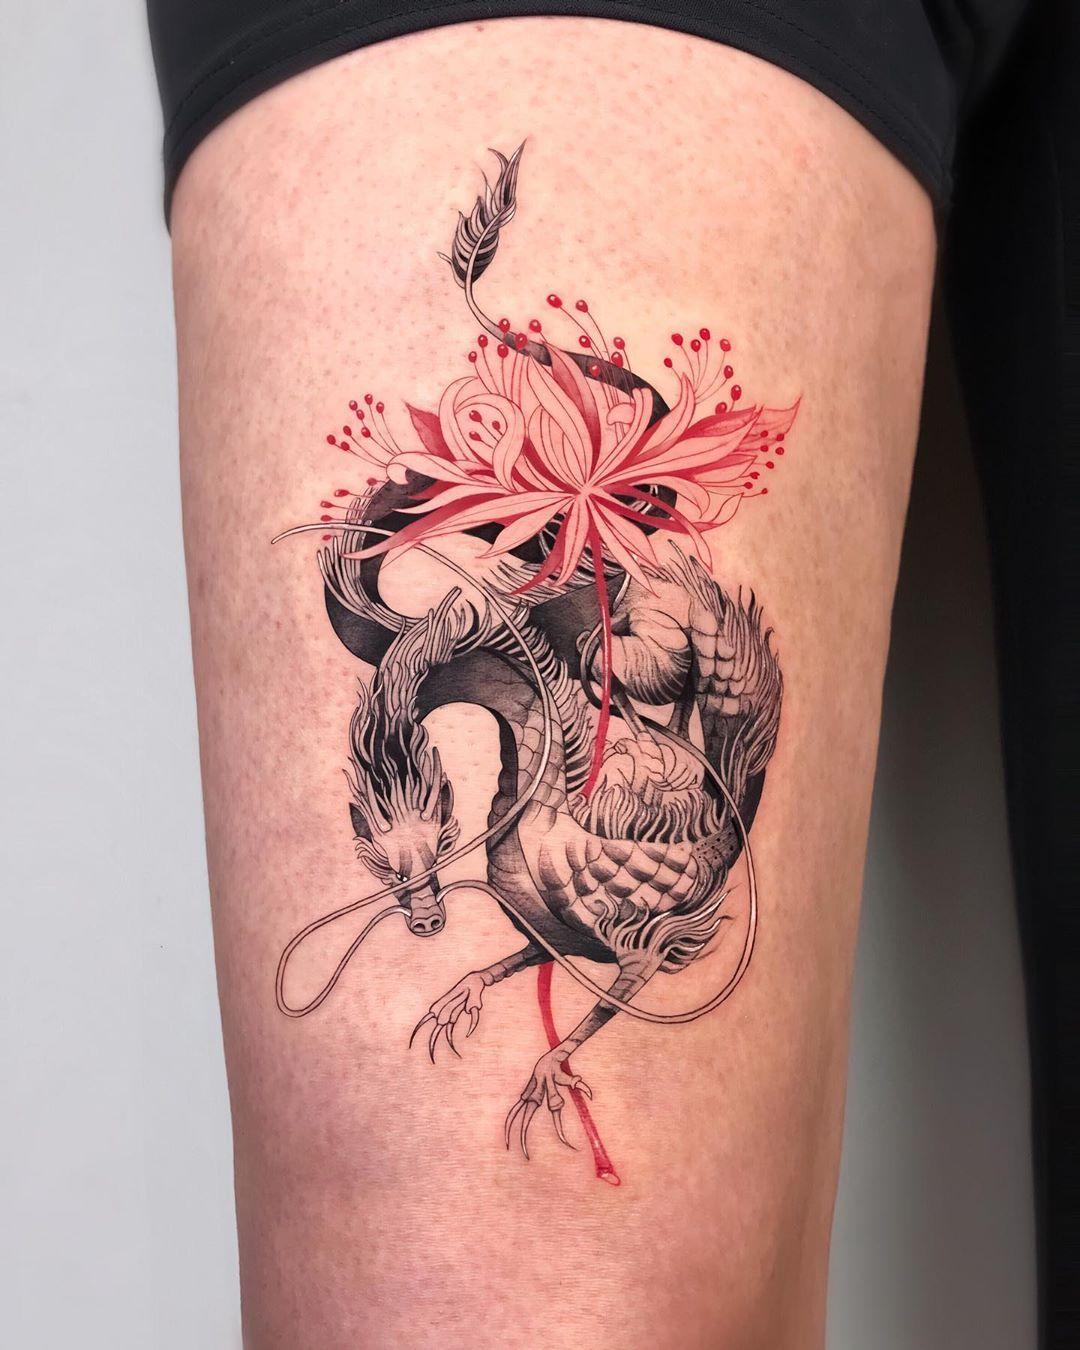 "Taylan Ulukır on Instagram: ""I had so much fun tattooing this custom design of a dragon/ spider lily! Thank you Ajdamira! 🐉🌸🐉🌸🐉 . . . . . #tattoodesign #snaketattoo…"""